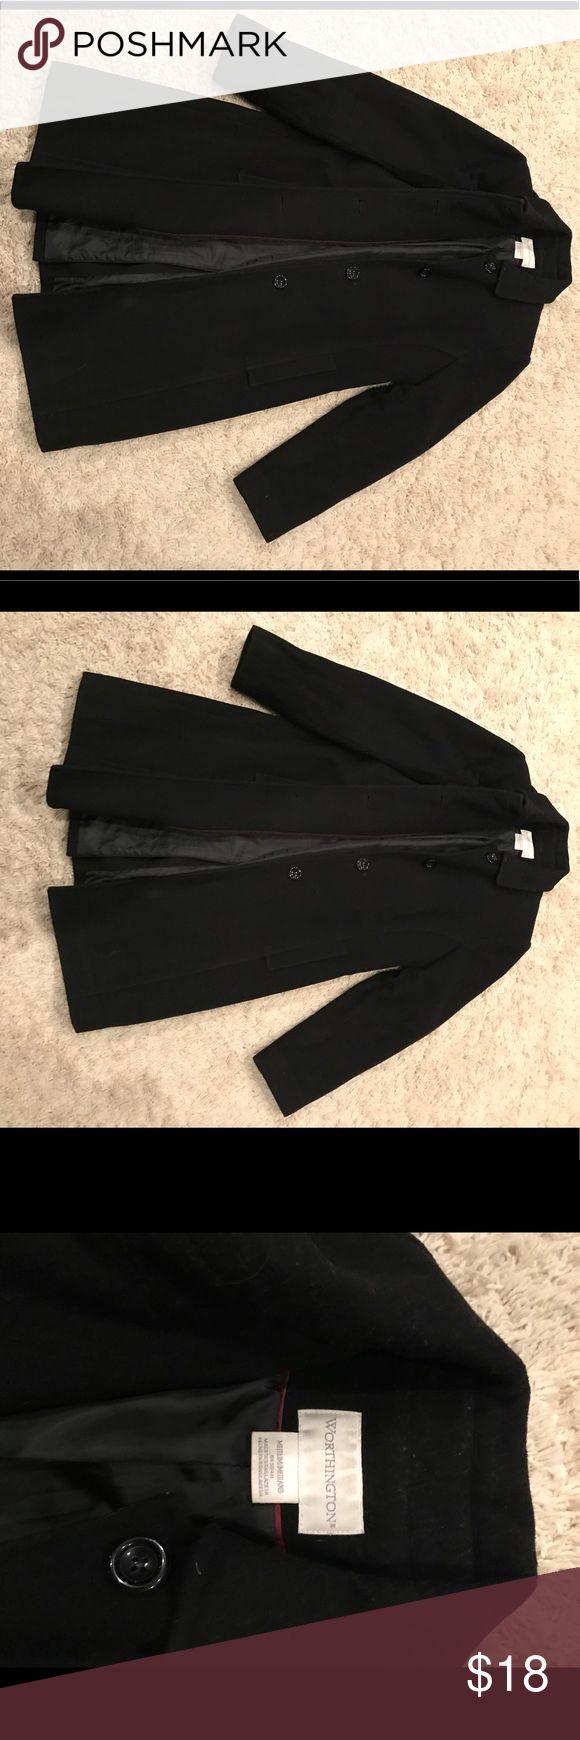 Worthington women's medium long black winter coat Worthington black long winter coat, button up. Women's medium. Worthington Jackets & Coats #coatswomen #blackwintercoats #women'swintercoatslong